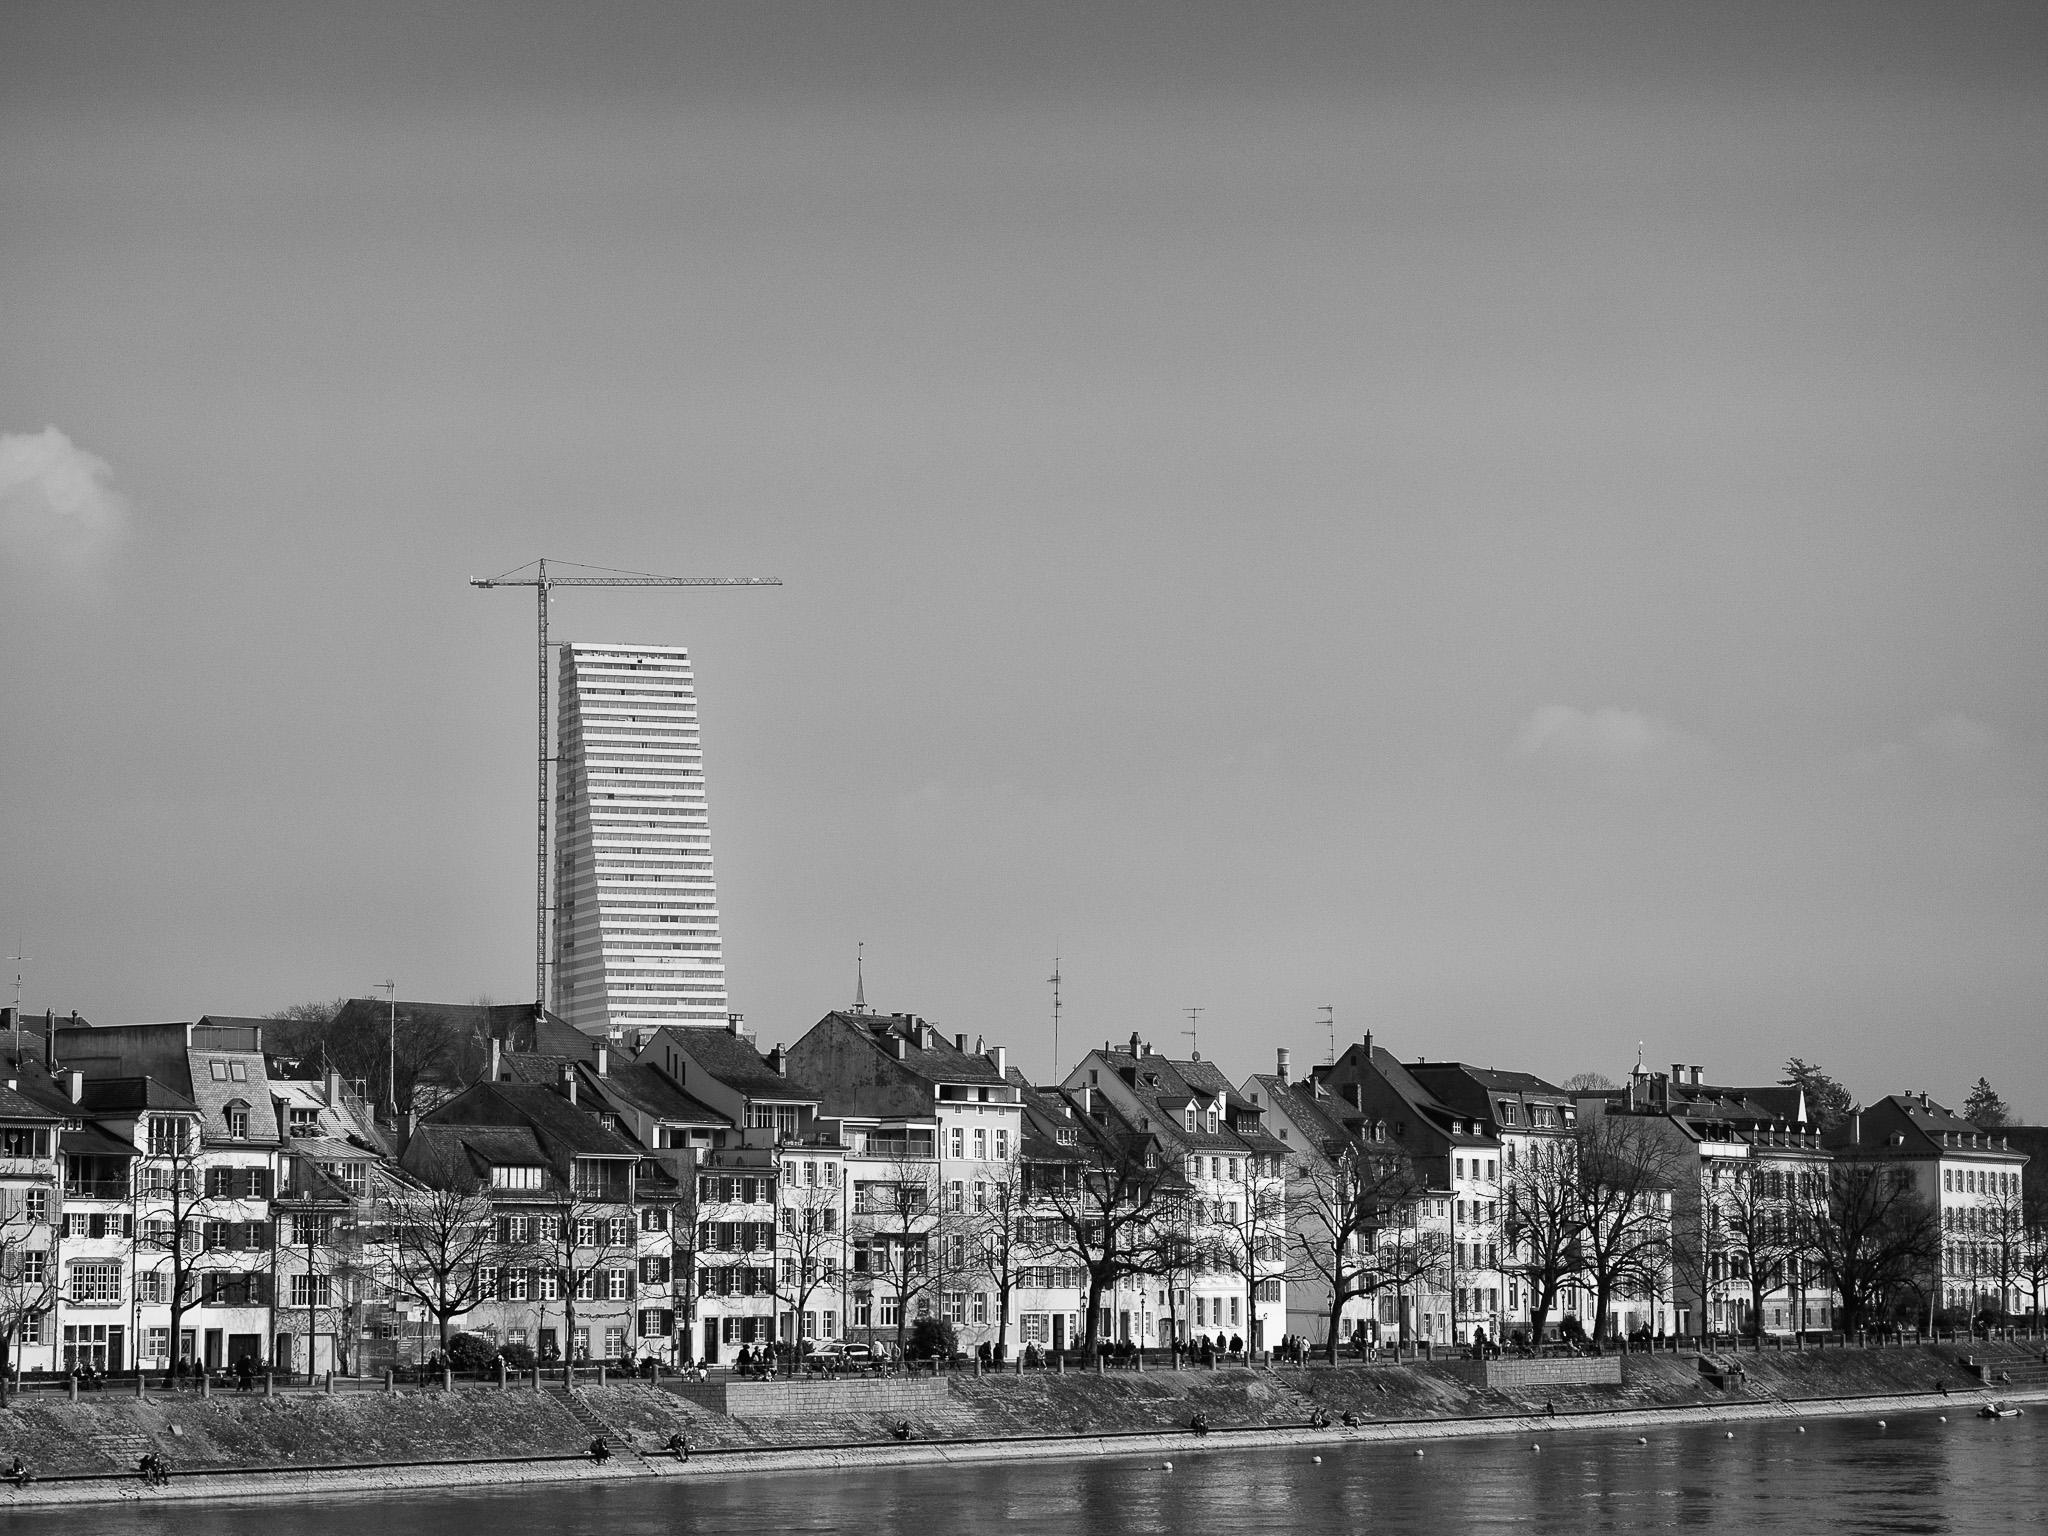 09-Basel-0035-P-1503.jpg